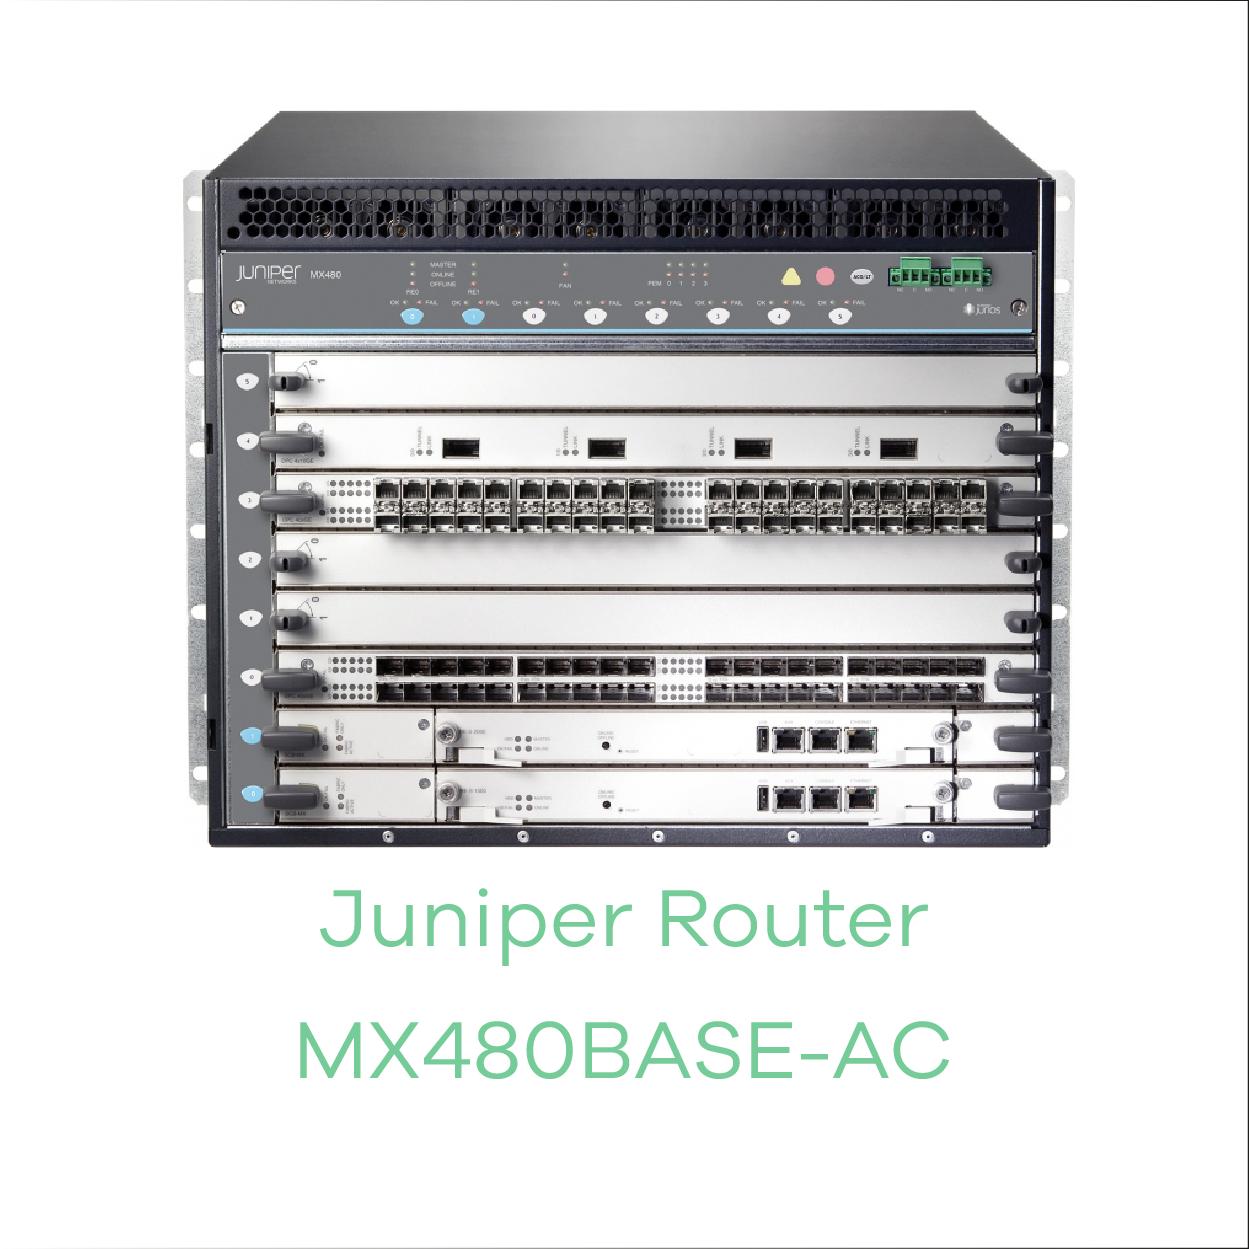 Juniper Router MX480BASE-AC